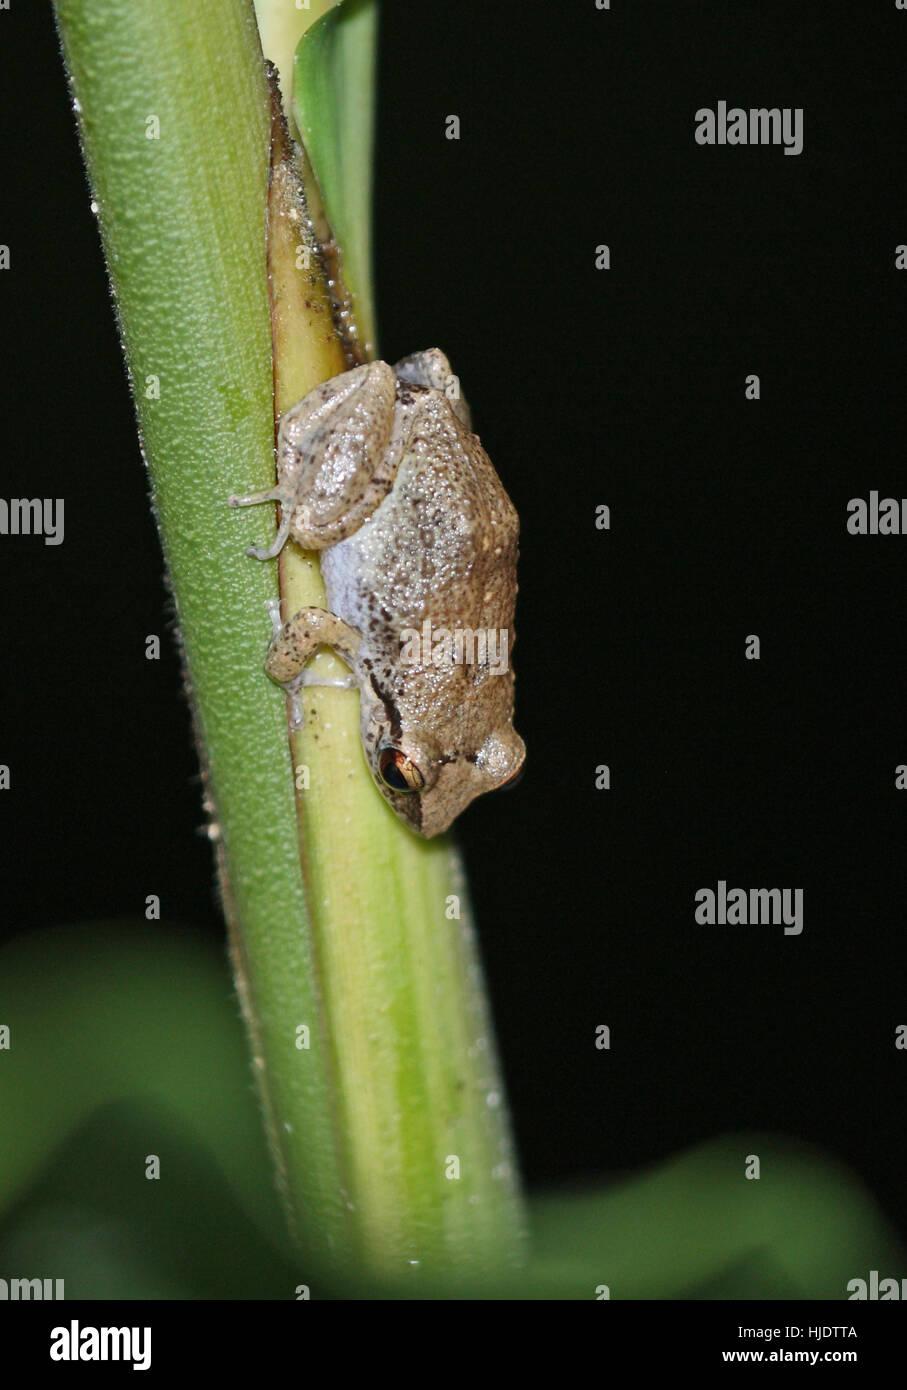 Lesser Antillean Whistling Frog (Eleutherodactylus johnstomei)   Fond Doux Plantation, St Lucia, Lesser Antilles - Stock Image